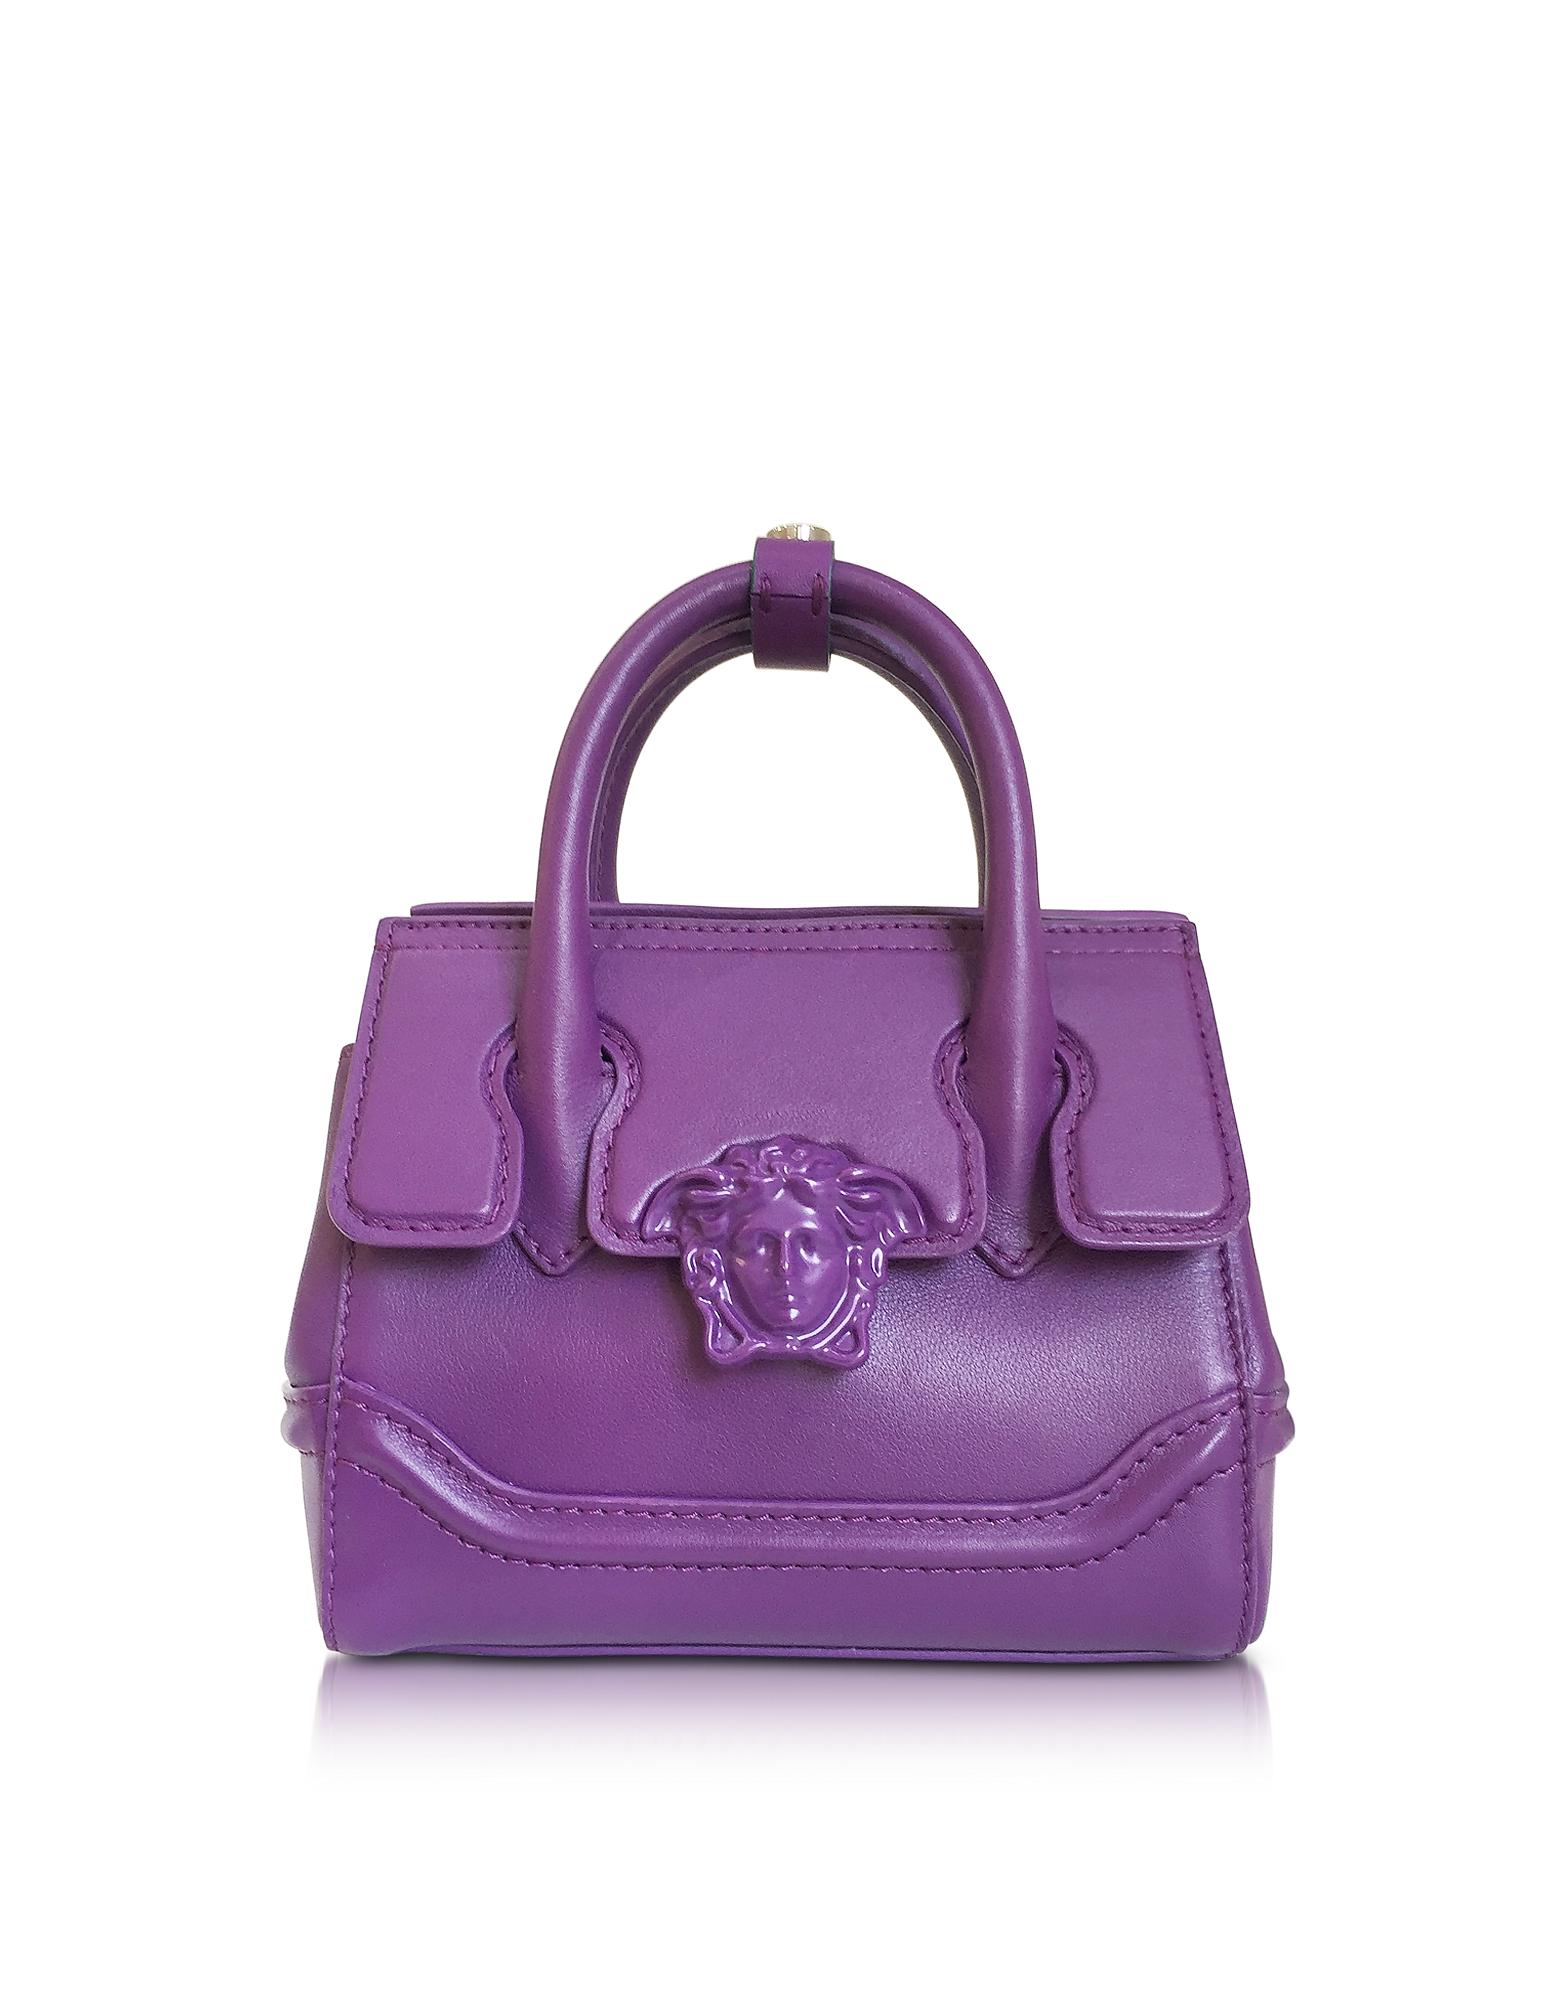 Versace Palazzo Empire Serene - Маленькая Фиолетовая Кожаная Сумка